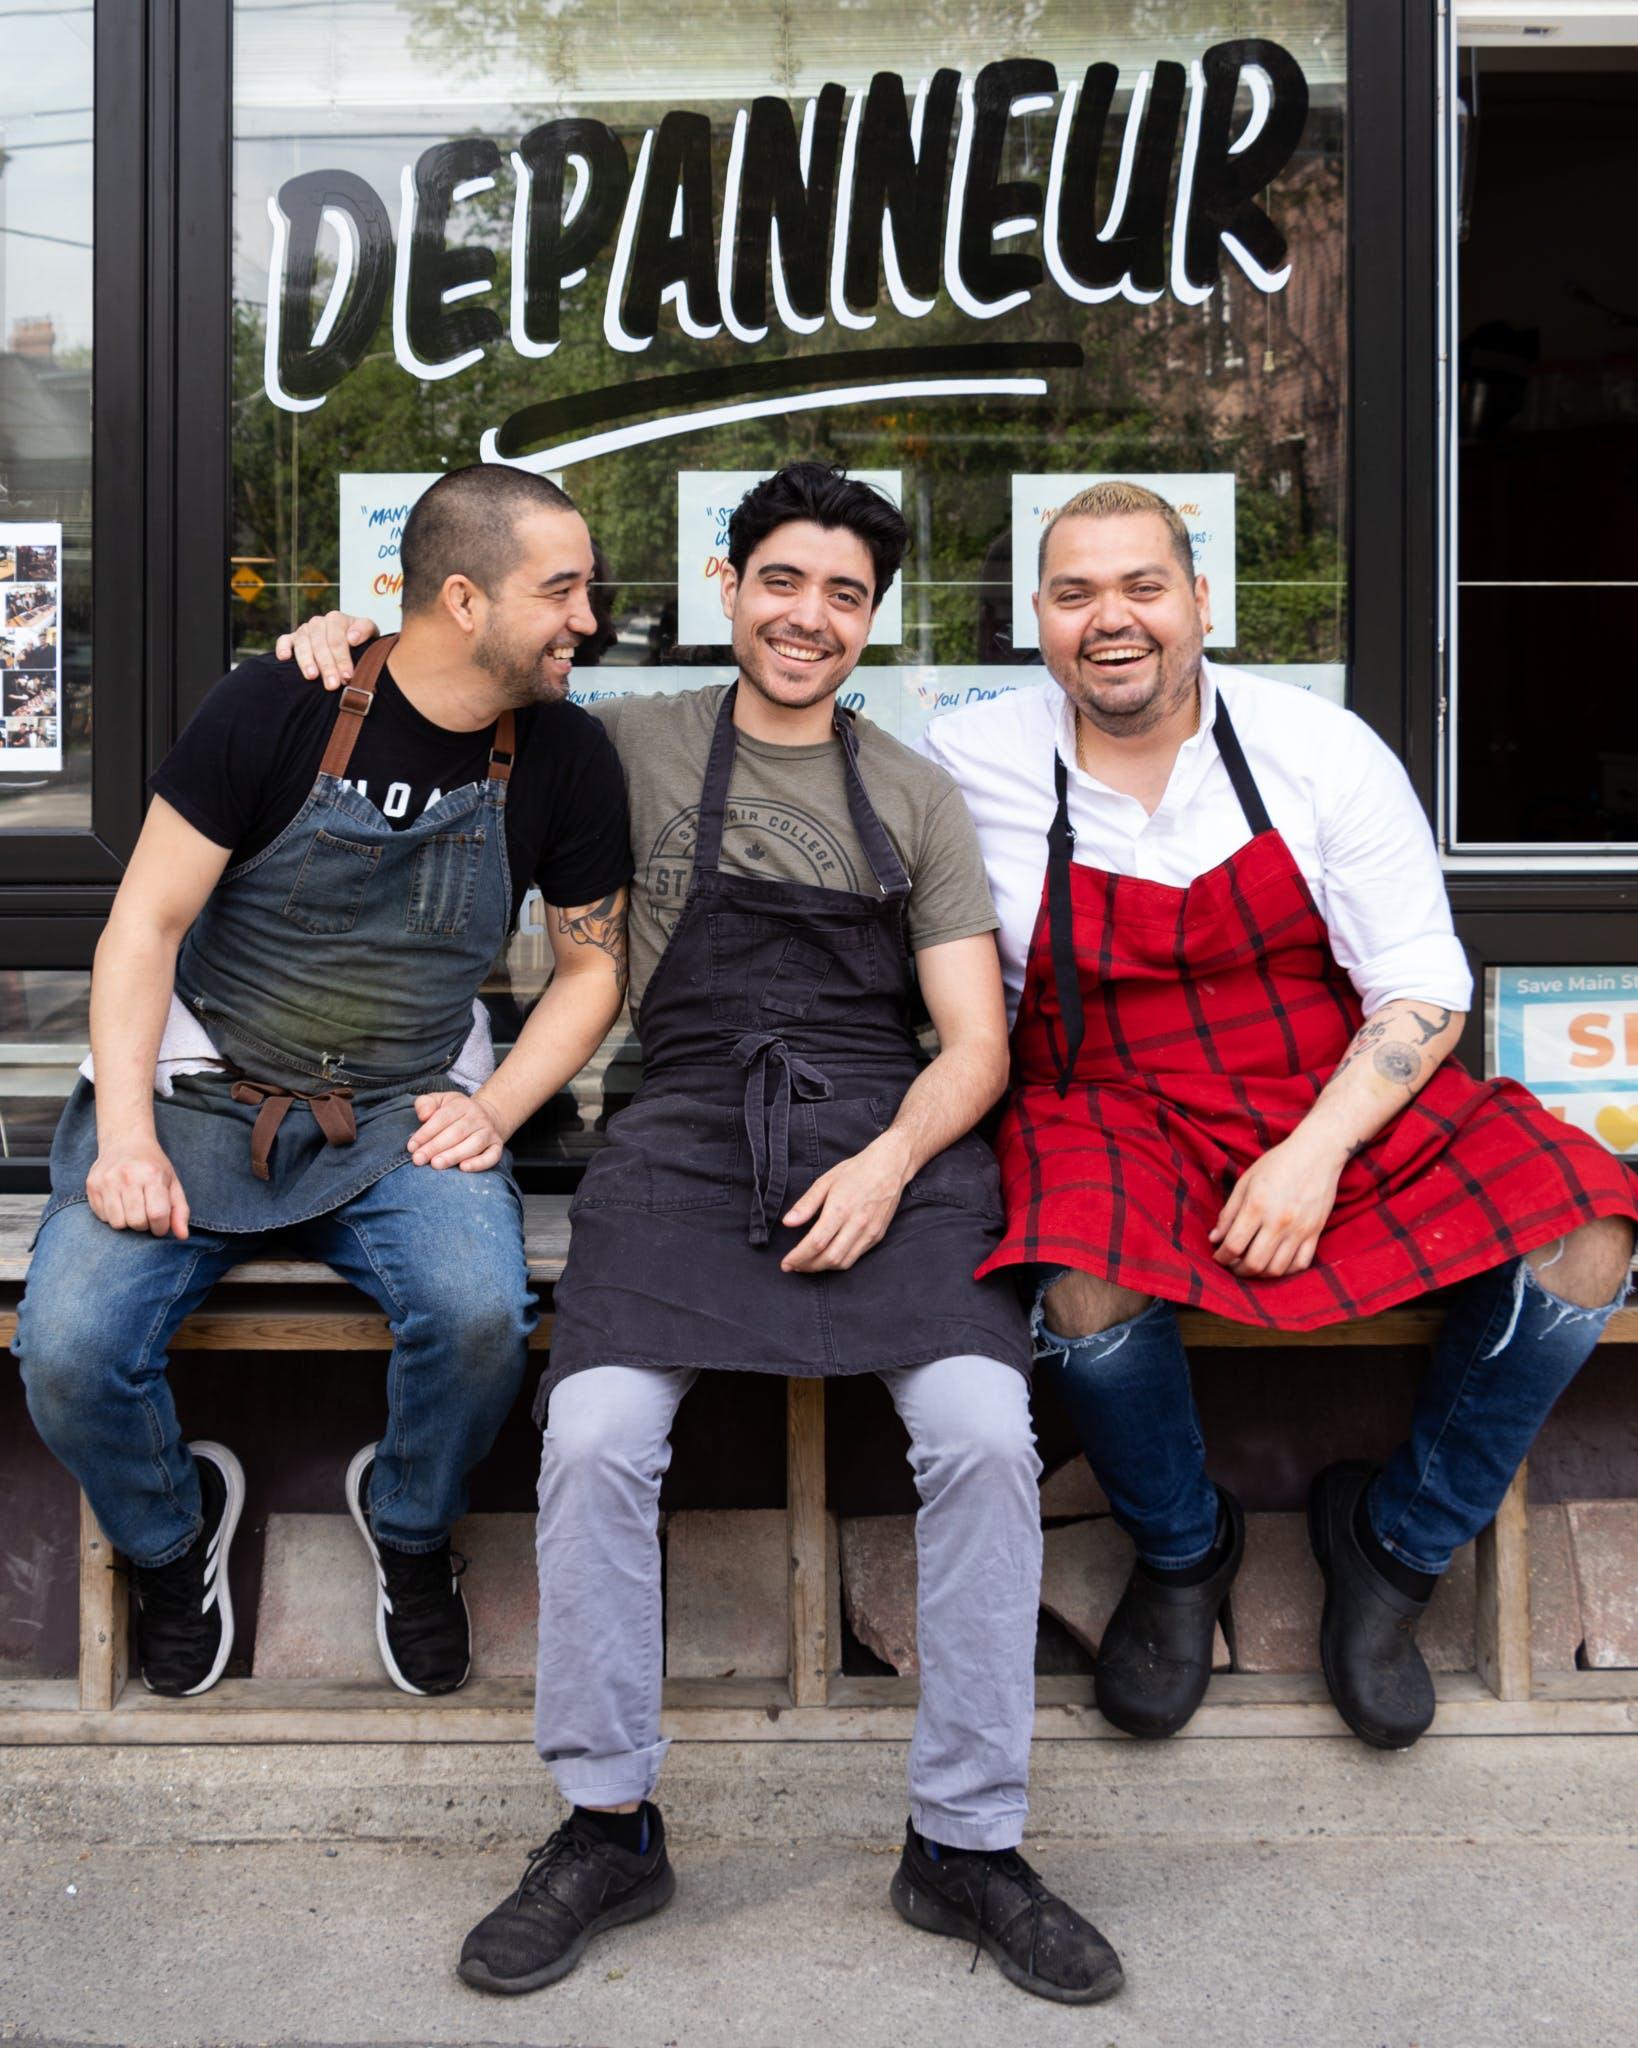 Aaron Okada, Steve Fernandes and Oskar Diaz outside The Depanneur